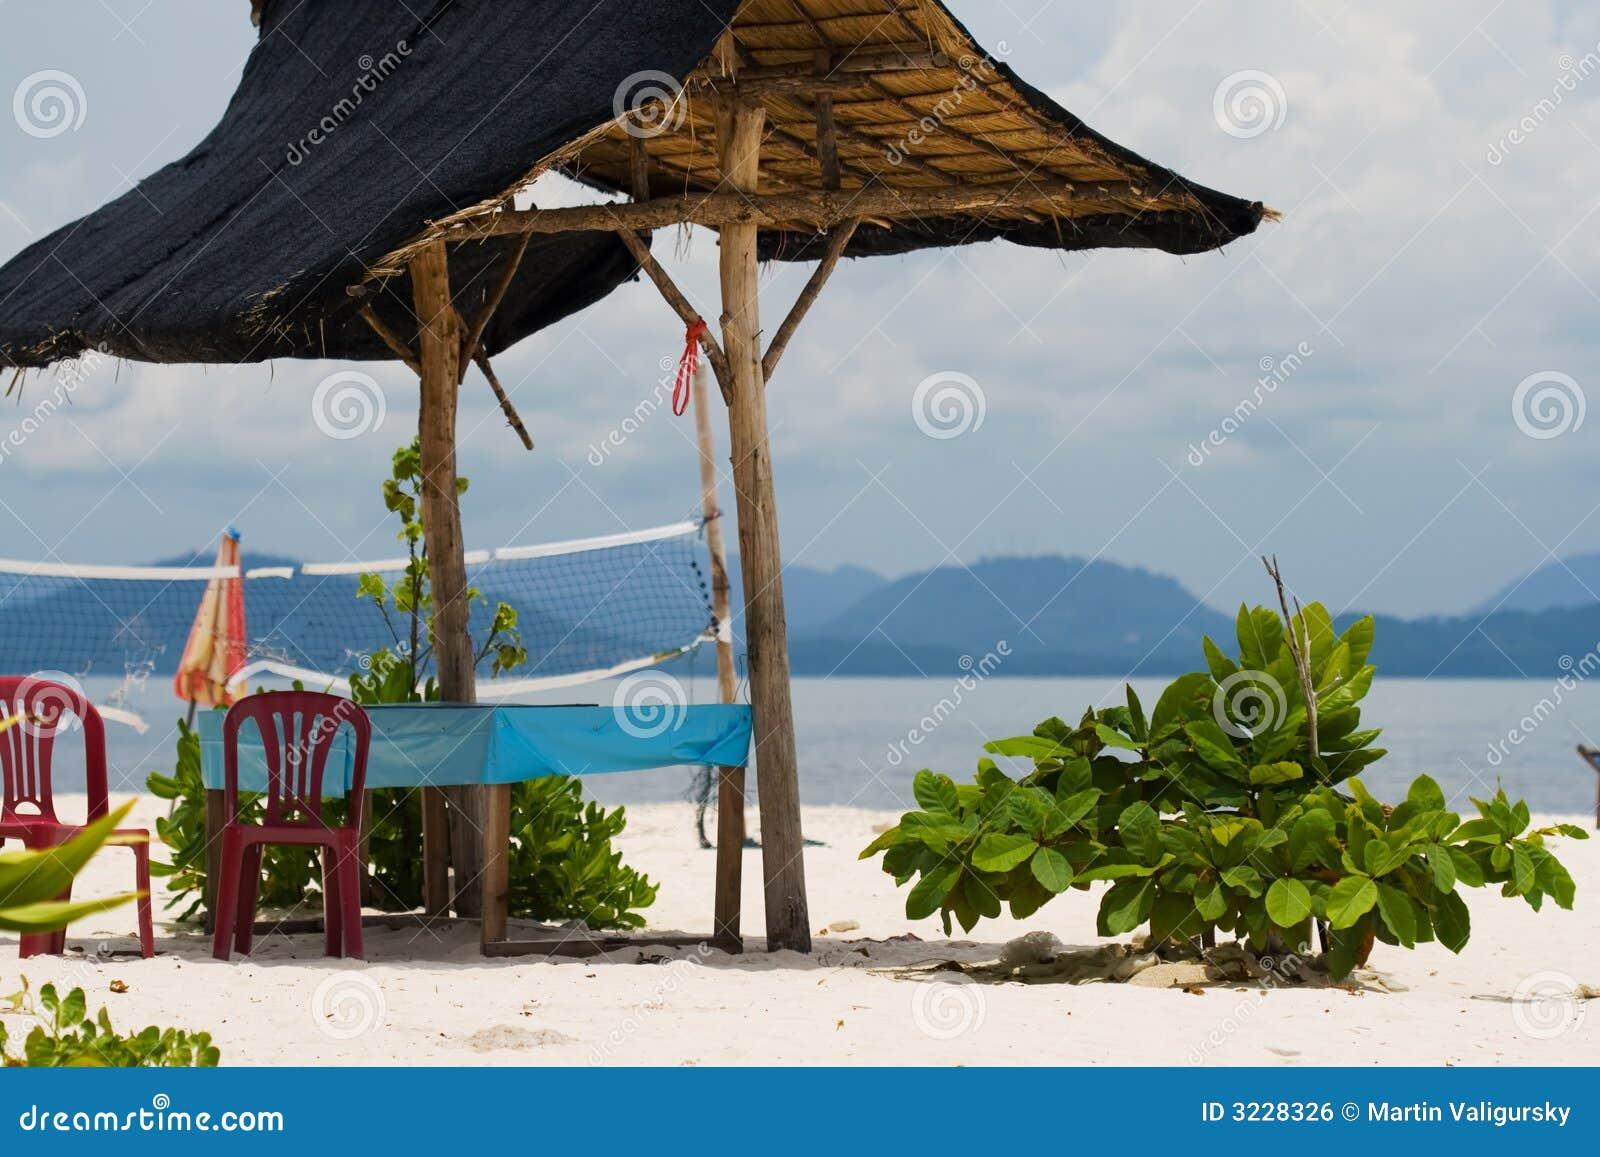 Tropical Island Beach Hut: Tropical Hut On The Beach Royalty Free Stock Image